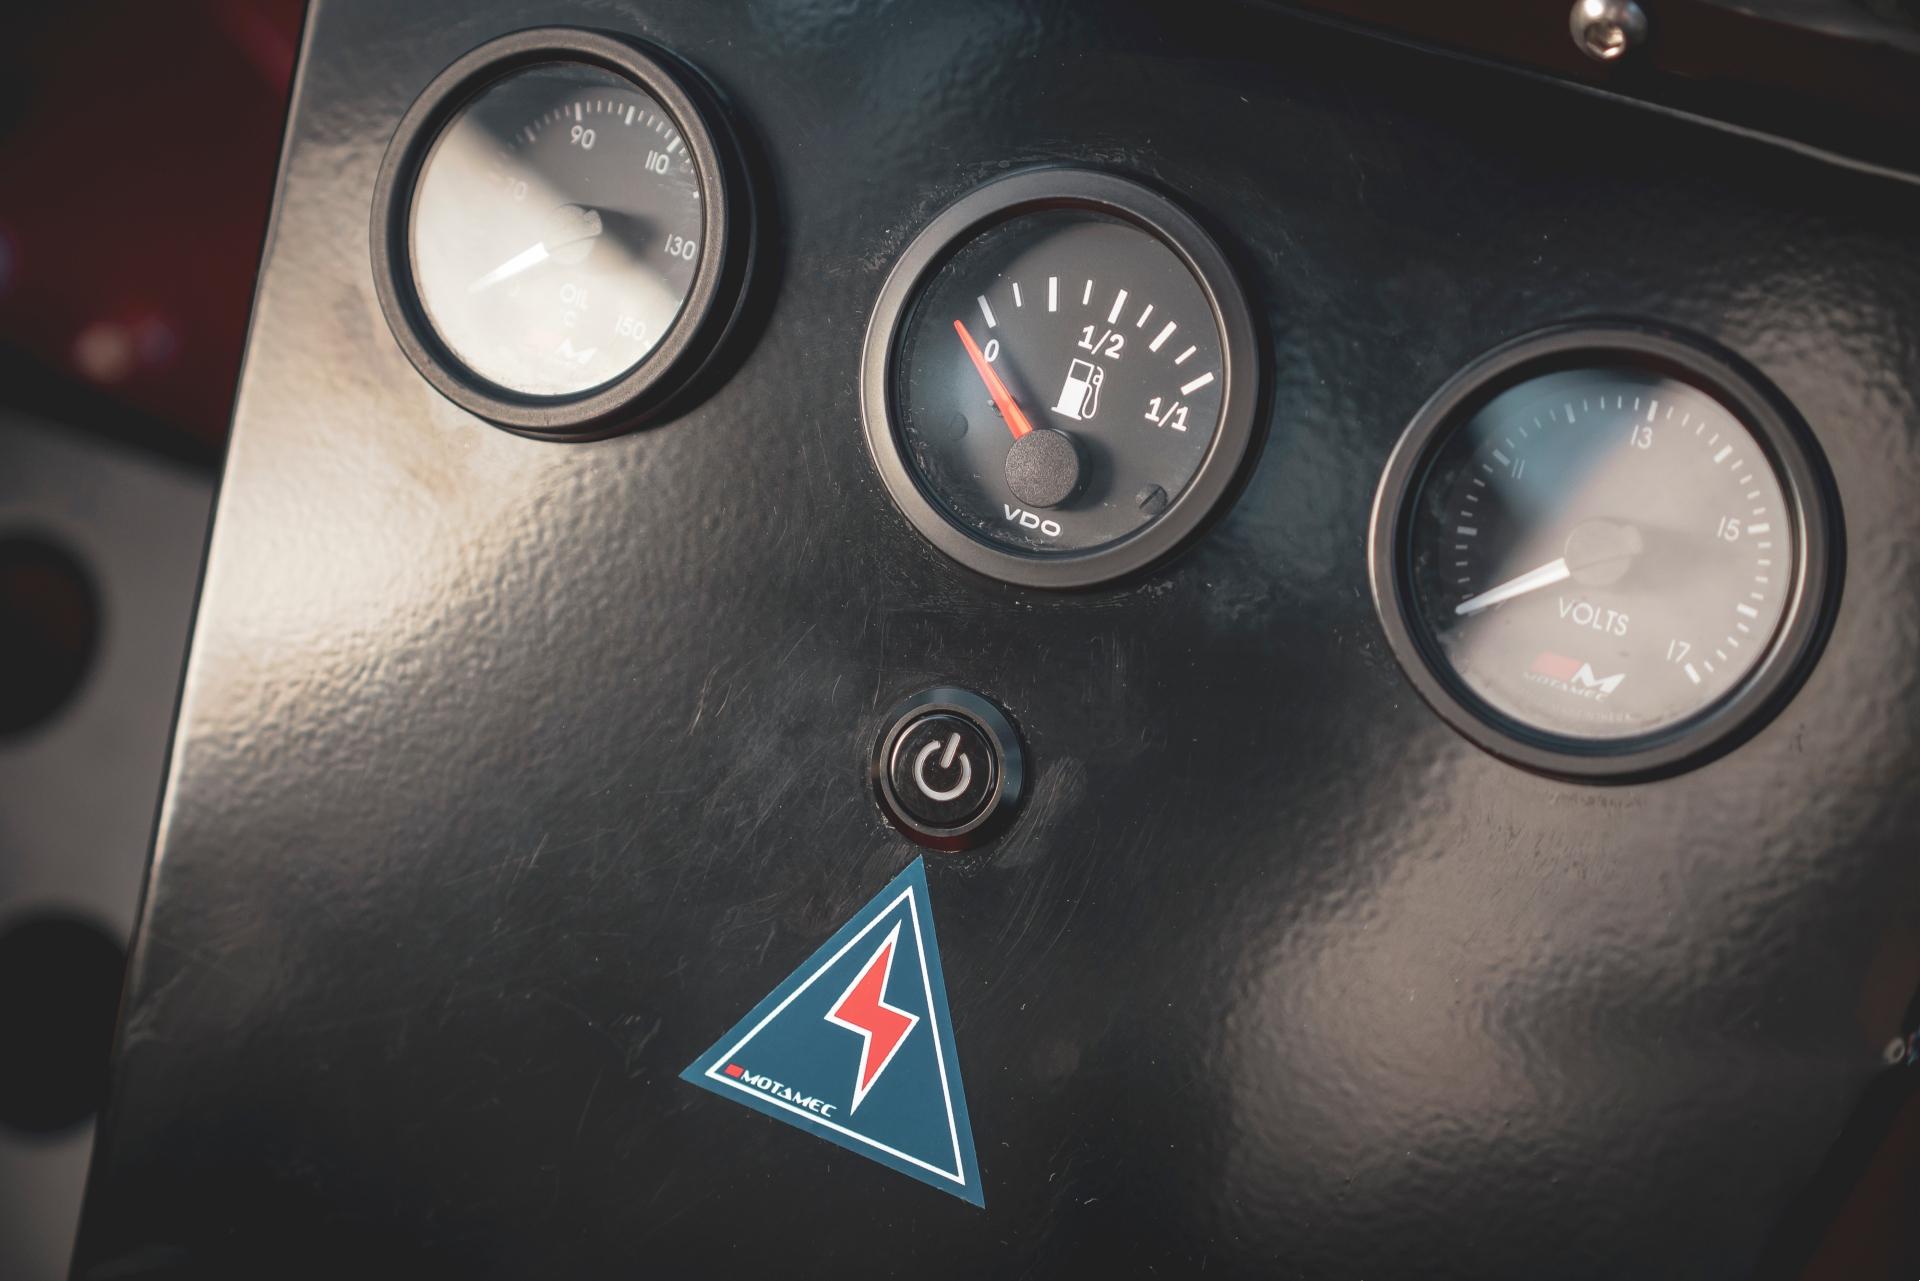 MST Mk2 gauges and power detail